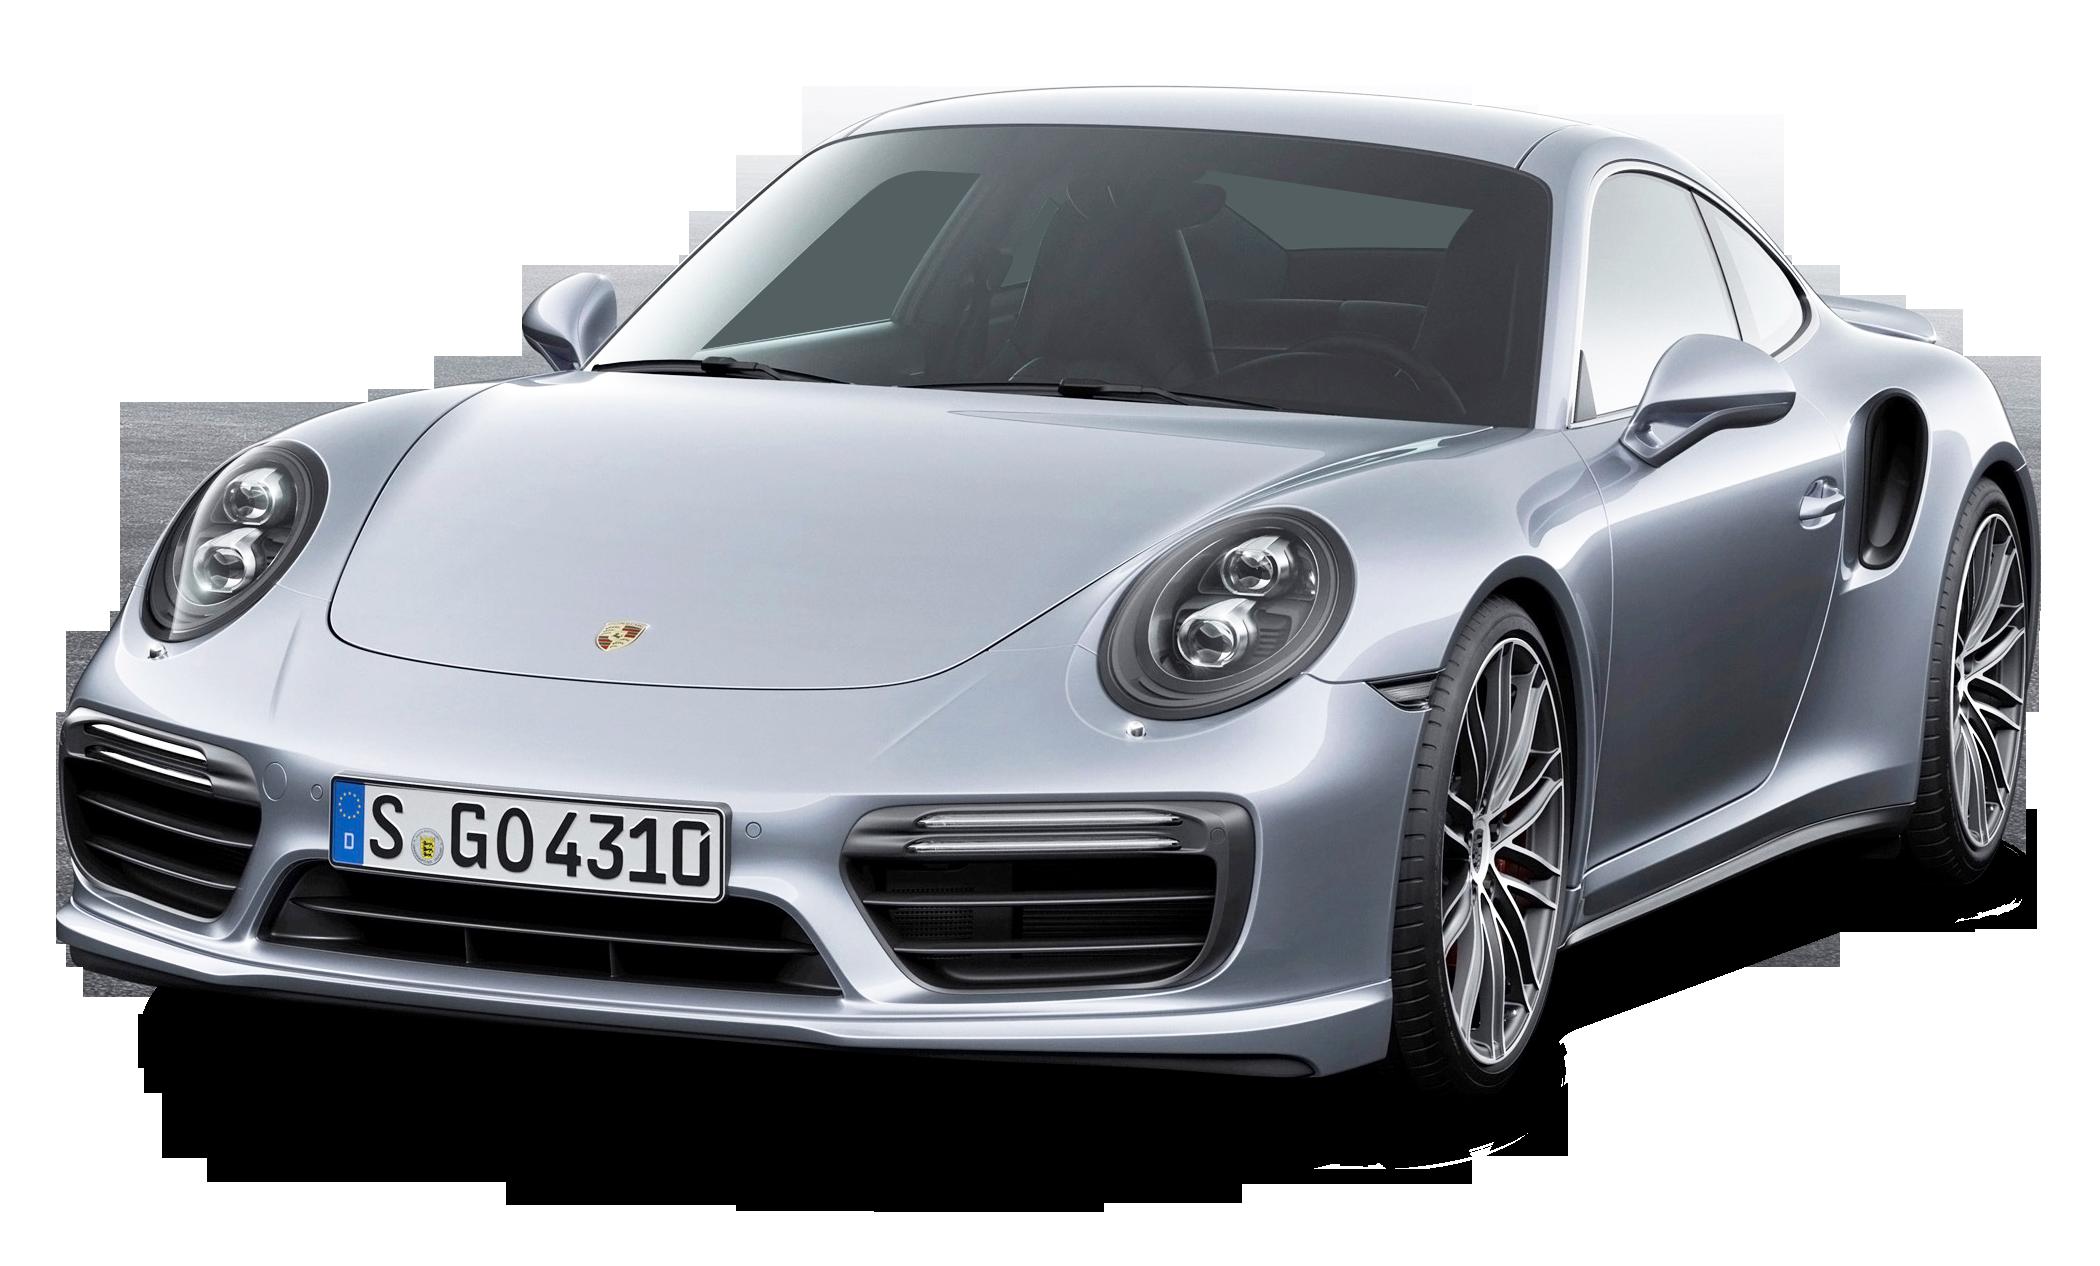 Porsche 911 Turbo Silver Car PNG Image